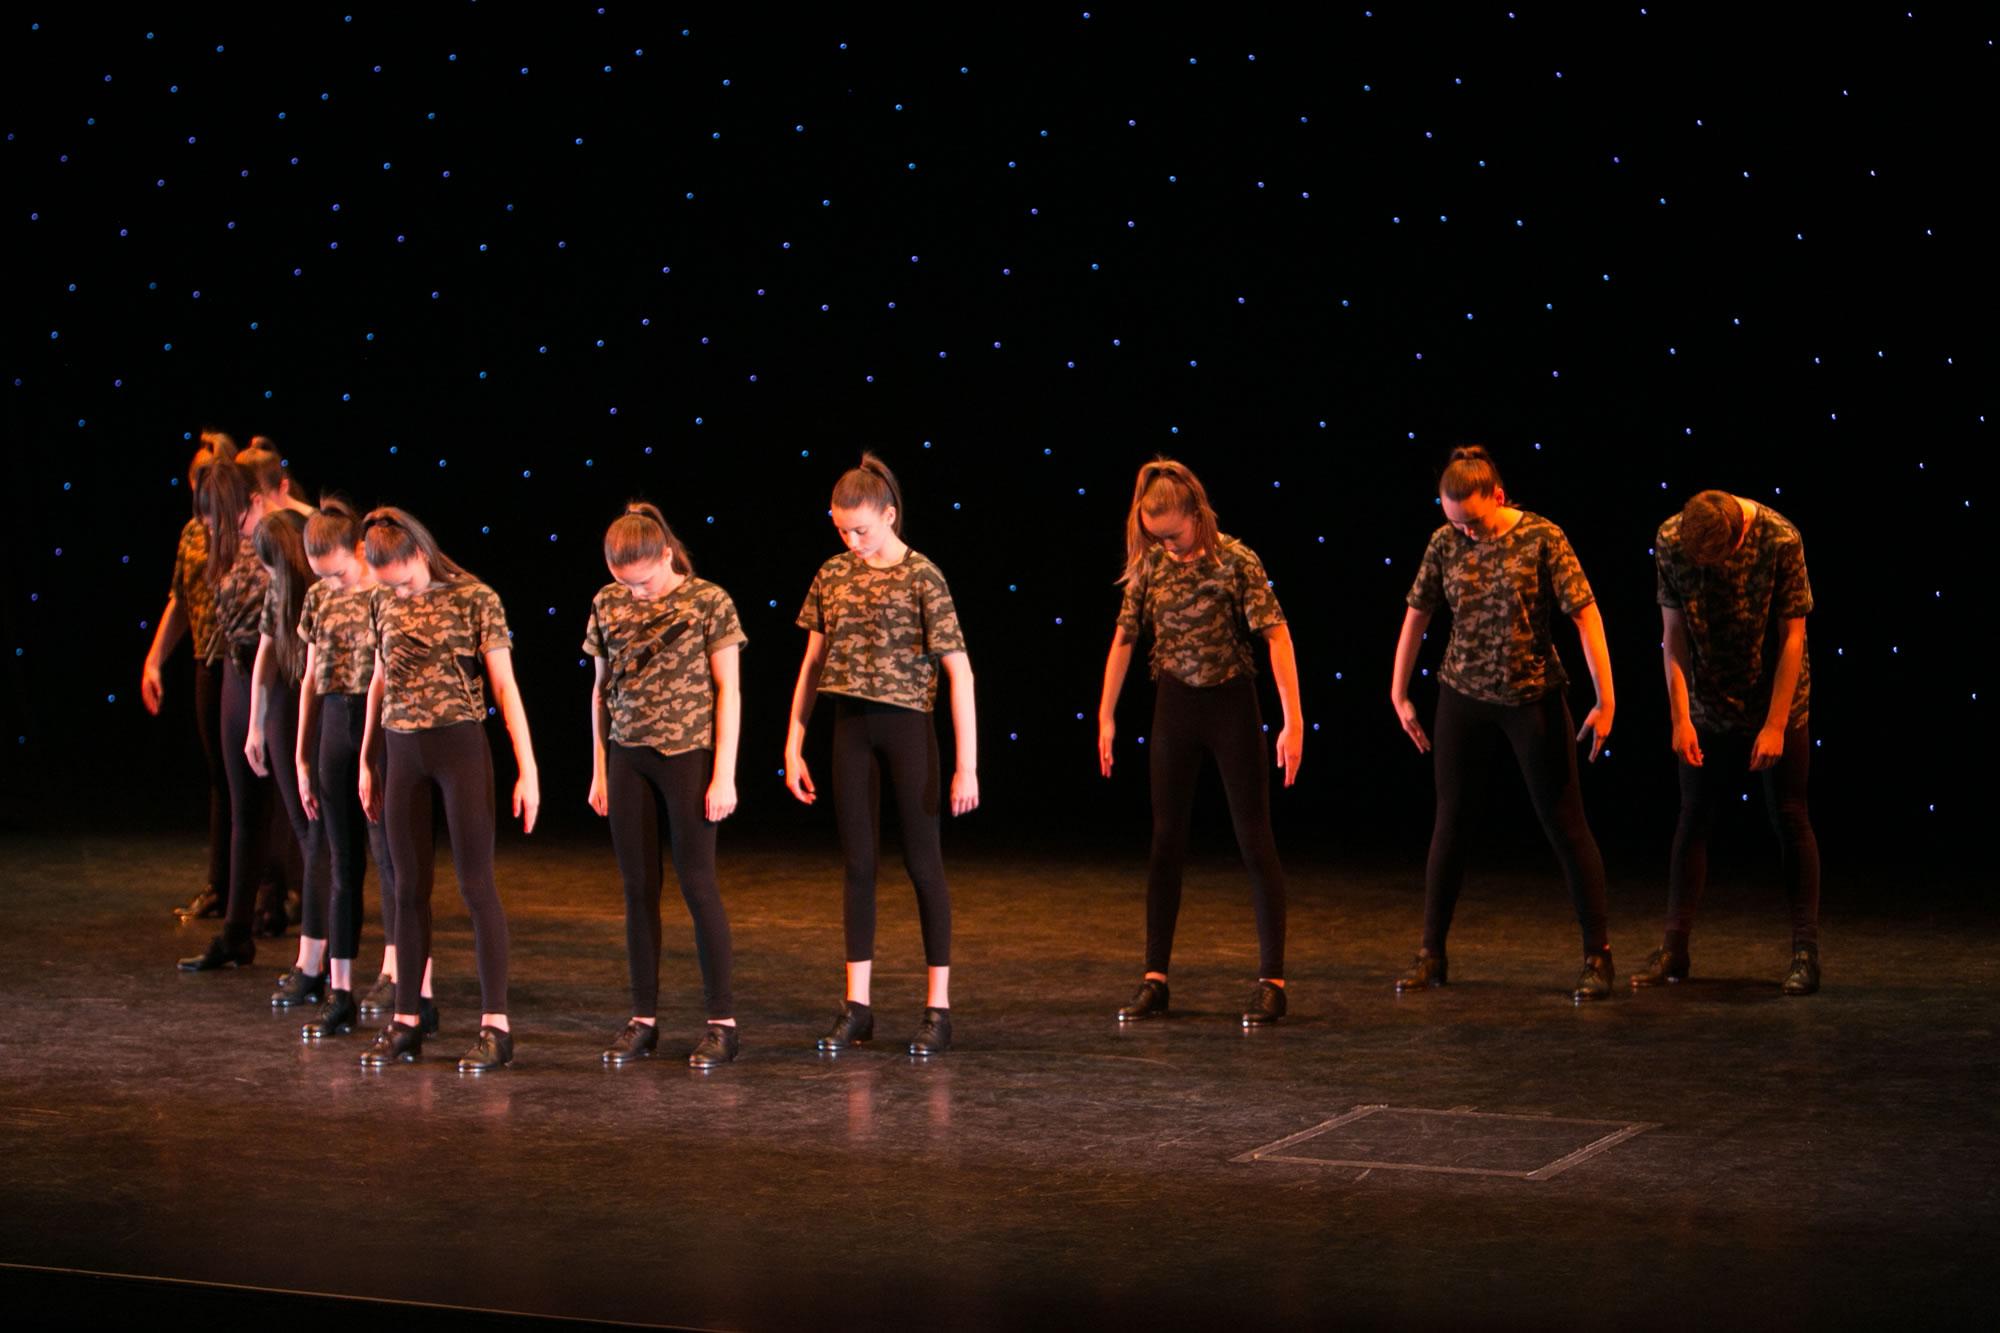 Hitchin_School_of_Dance_Show_2019-SM1_3226.jpg